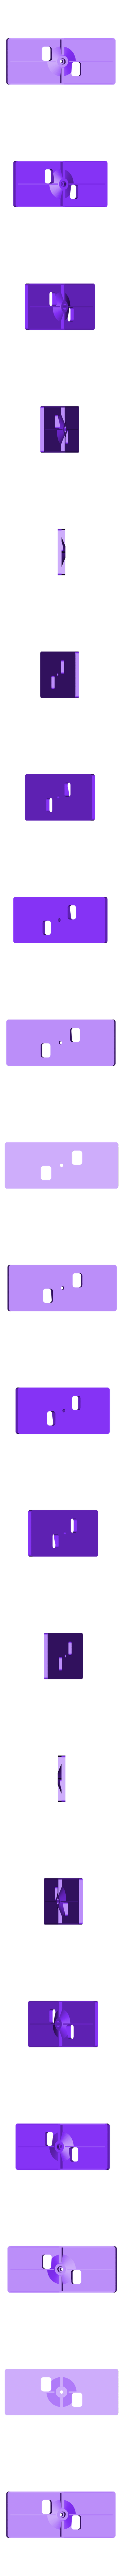 roll02.STL Download free STL file Pan, tilt and roll camera pod for FPV. • 3D printing object, tahustvedt